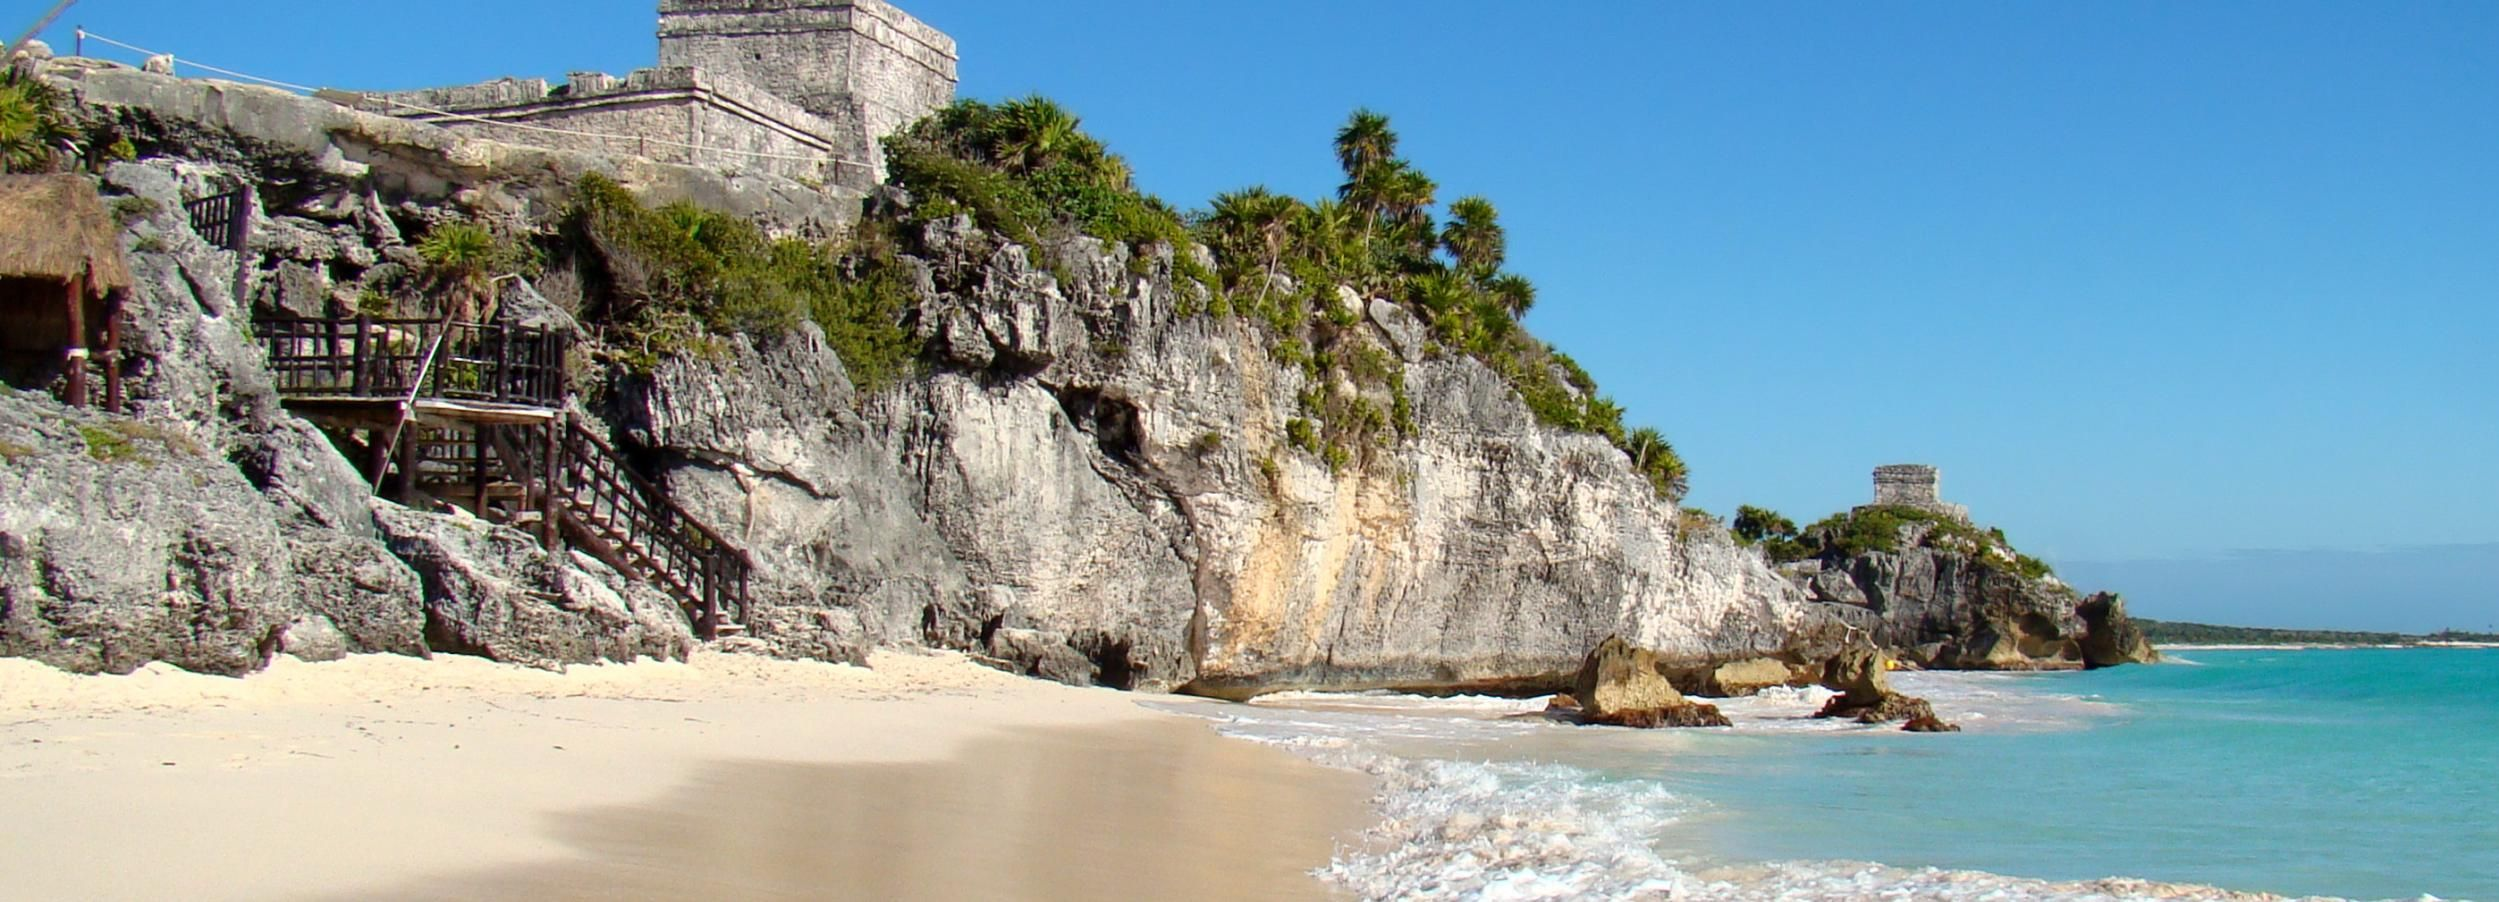 Ab Playa del Carmen: Tulum Ruinen, Höhlen & Schildkröten